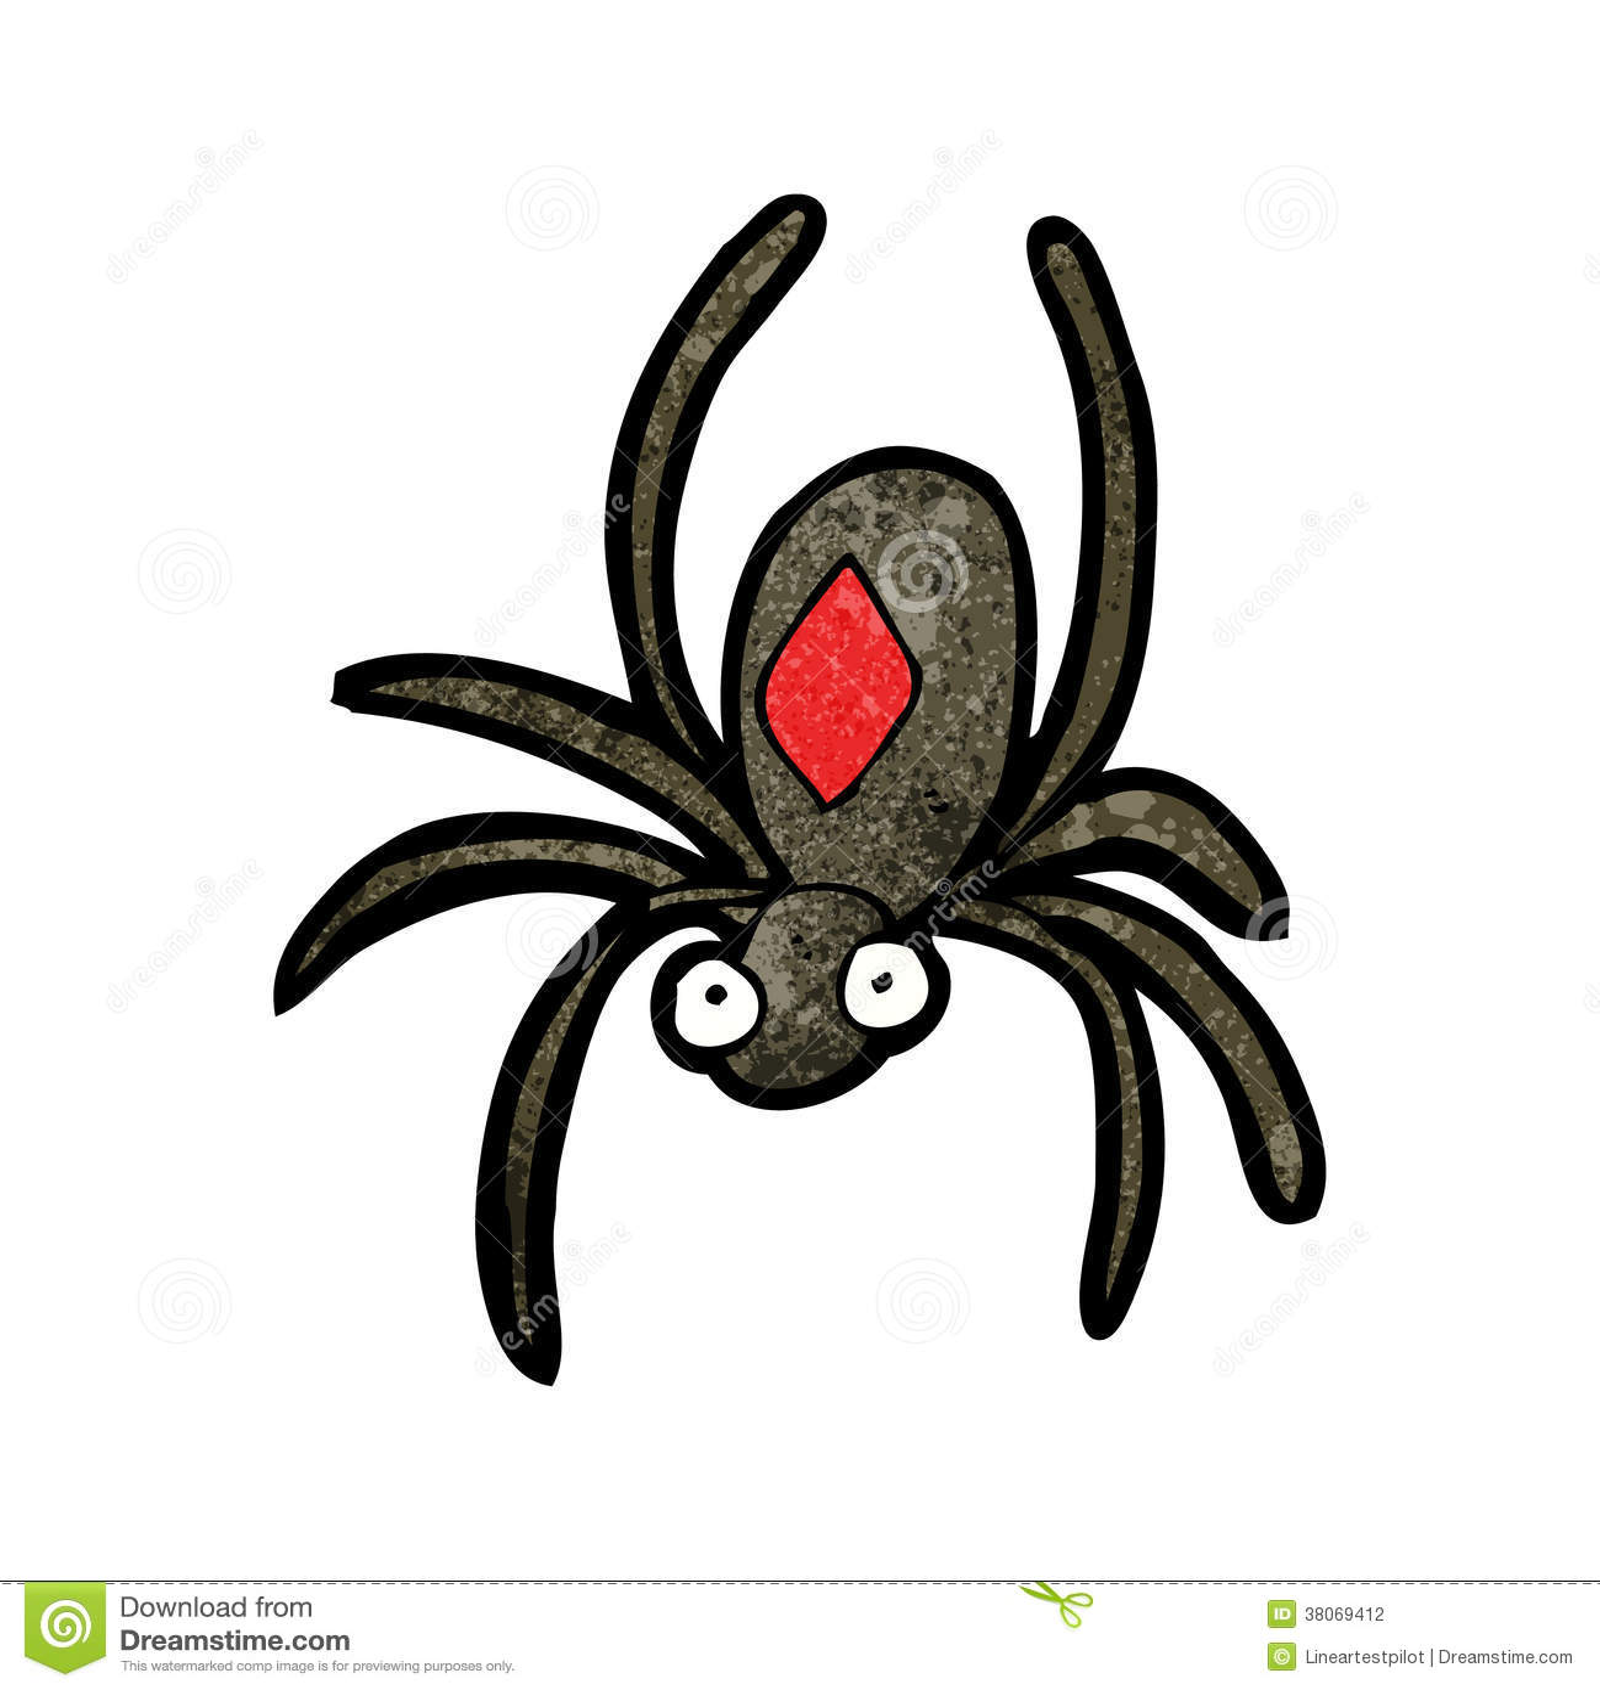 Black Widow Spider Cartoon Stock Photography - Image: 38069412